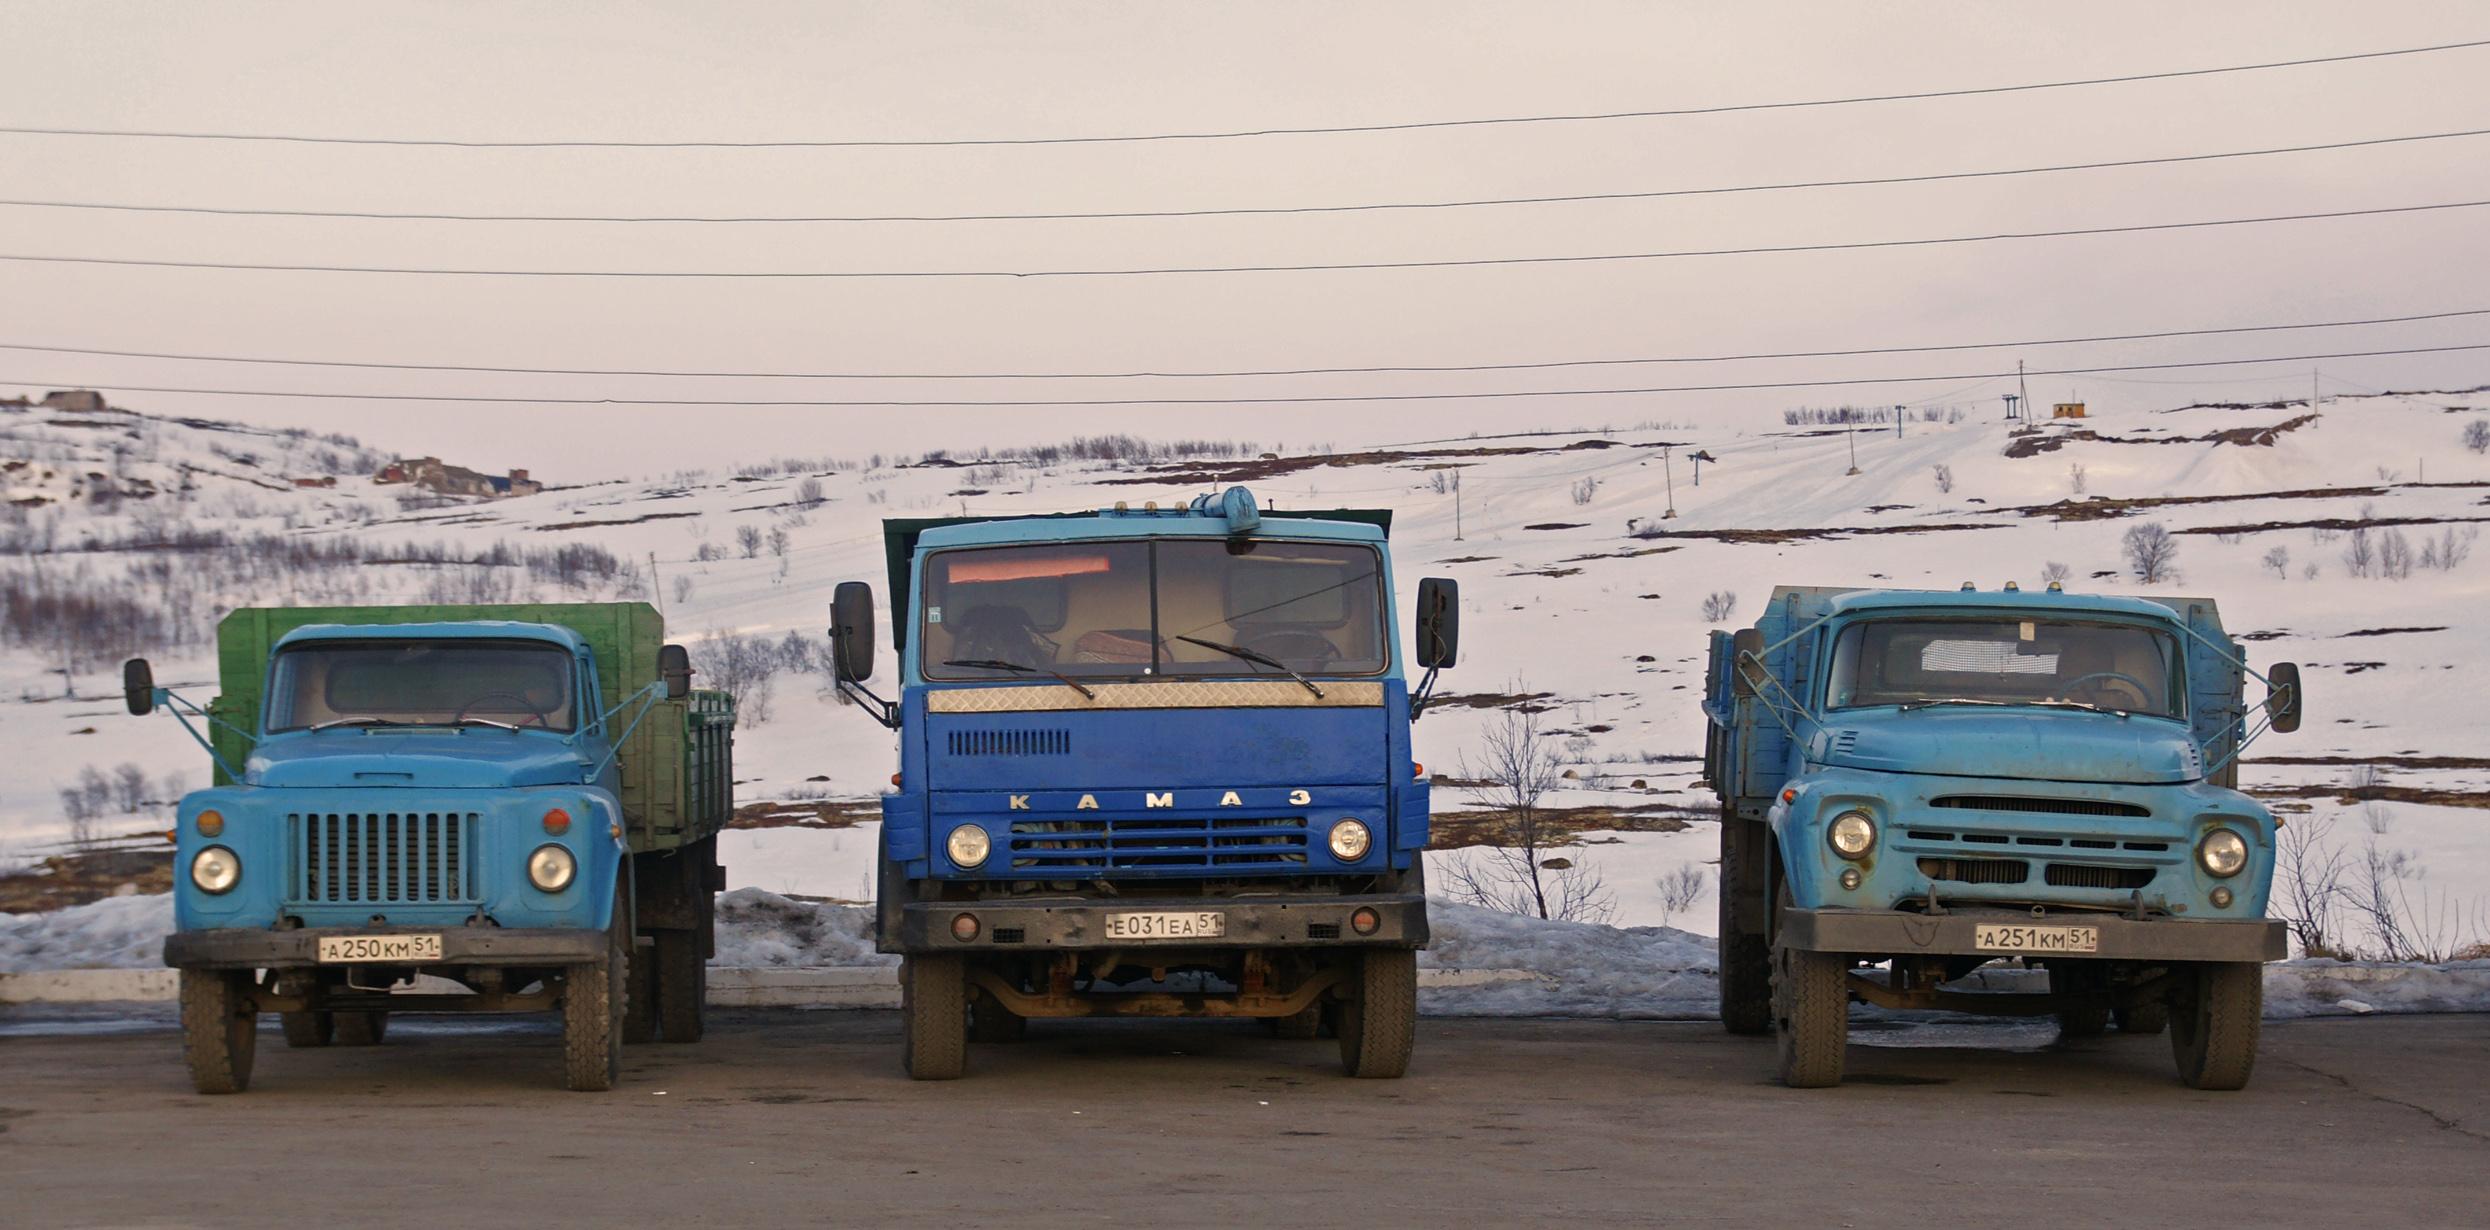 File:Kamaz - vehicles of Russia.jpg - Wikimedia Commons